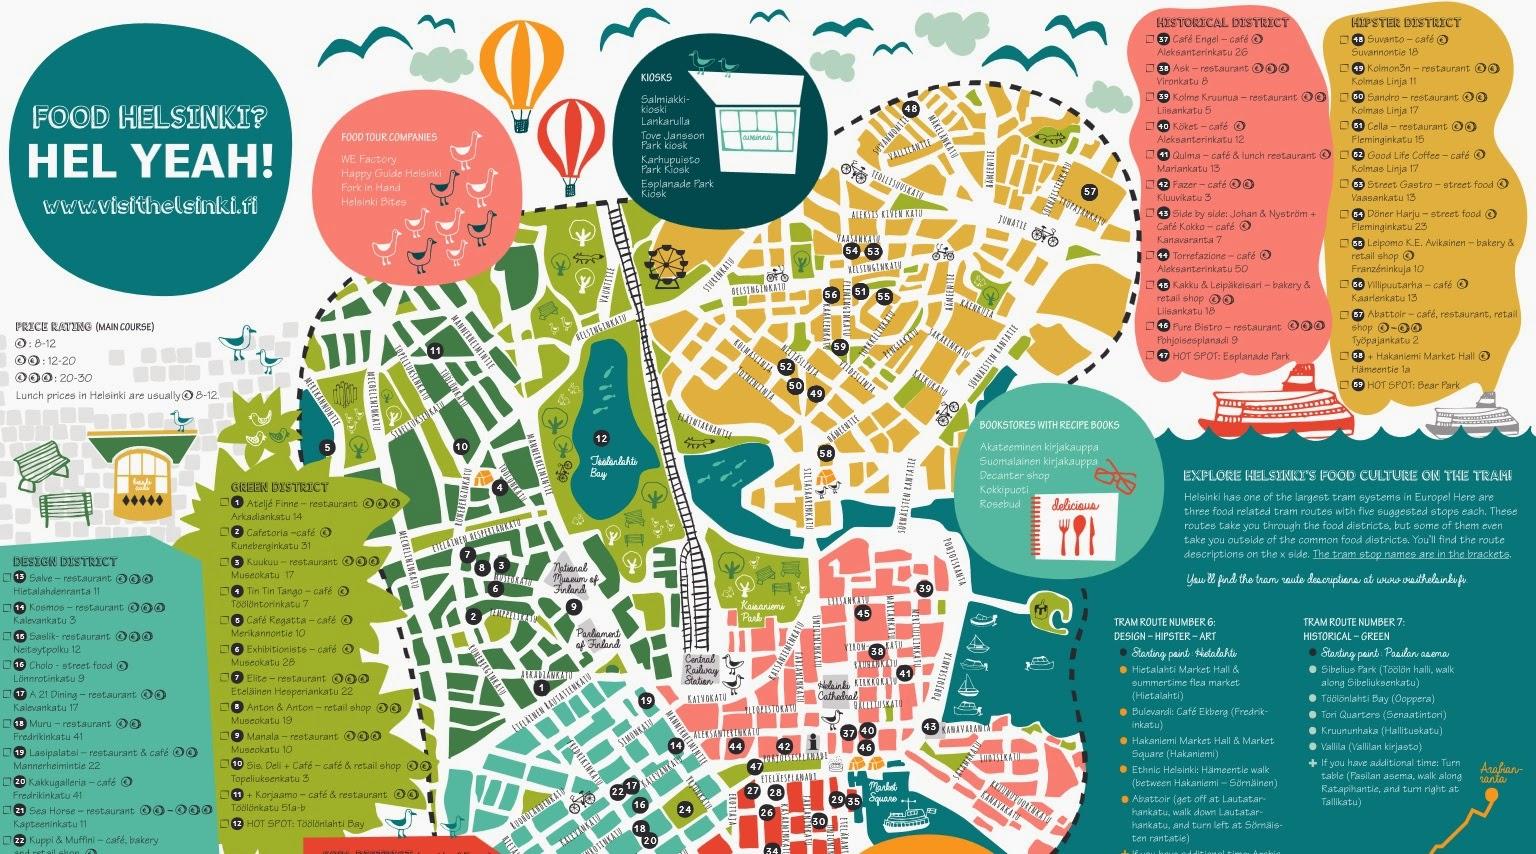 http://www.visithelsinki.fi/sites/visithelsinki.fi/files/files/Liitteet/food_helsinki_hel_yeah_map.pdf